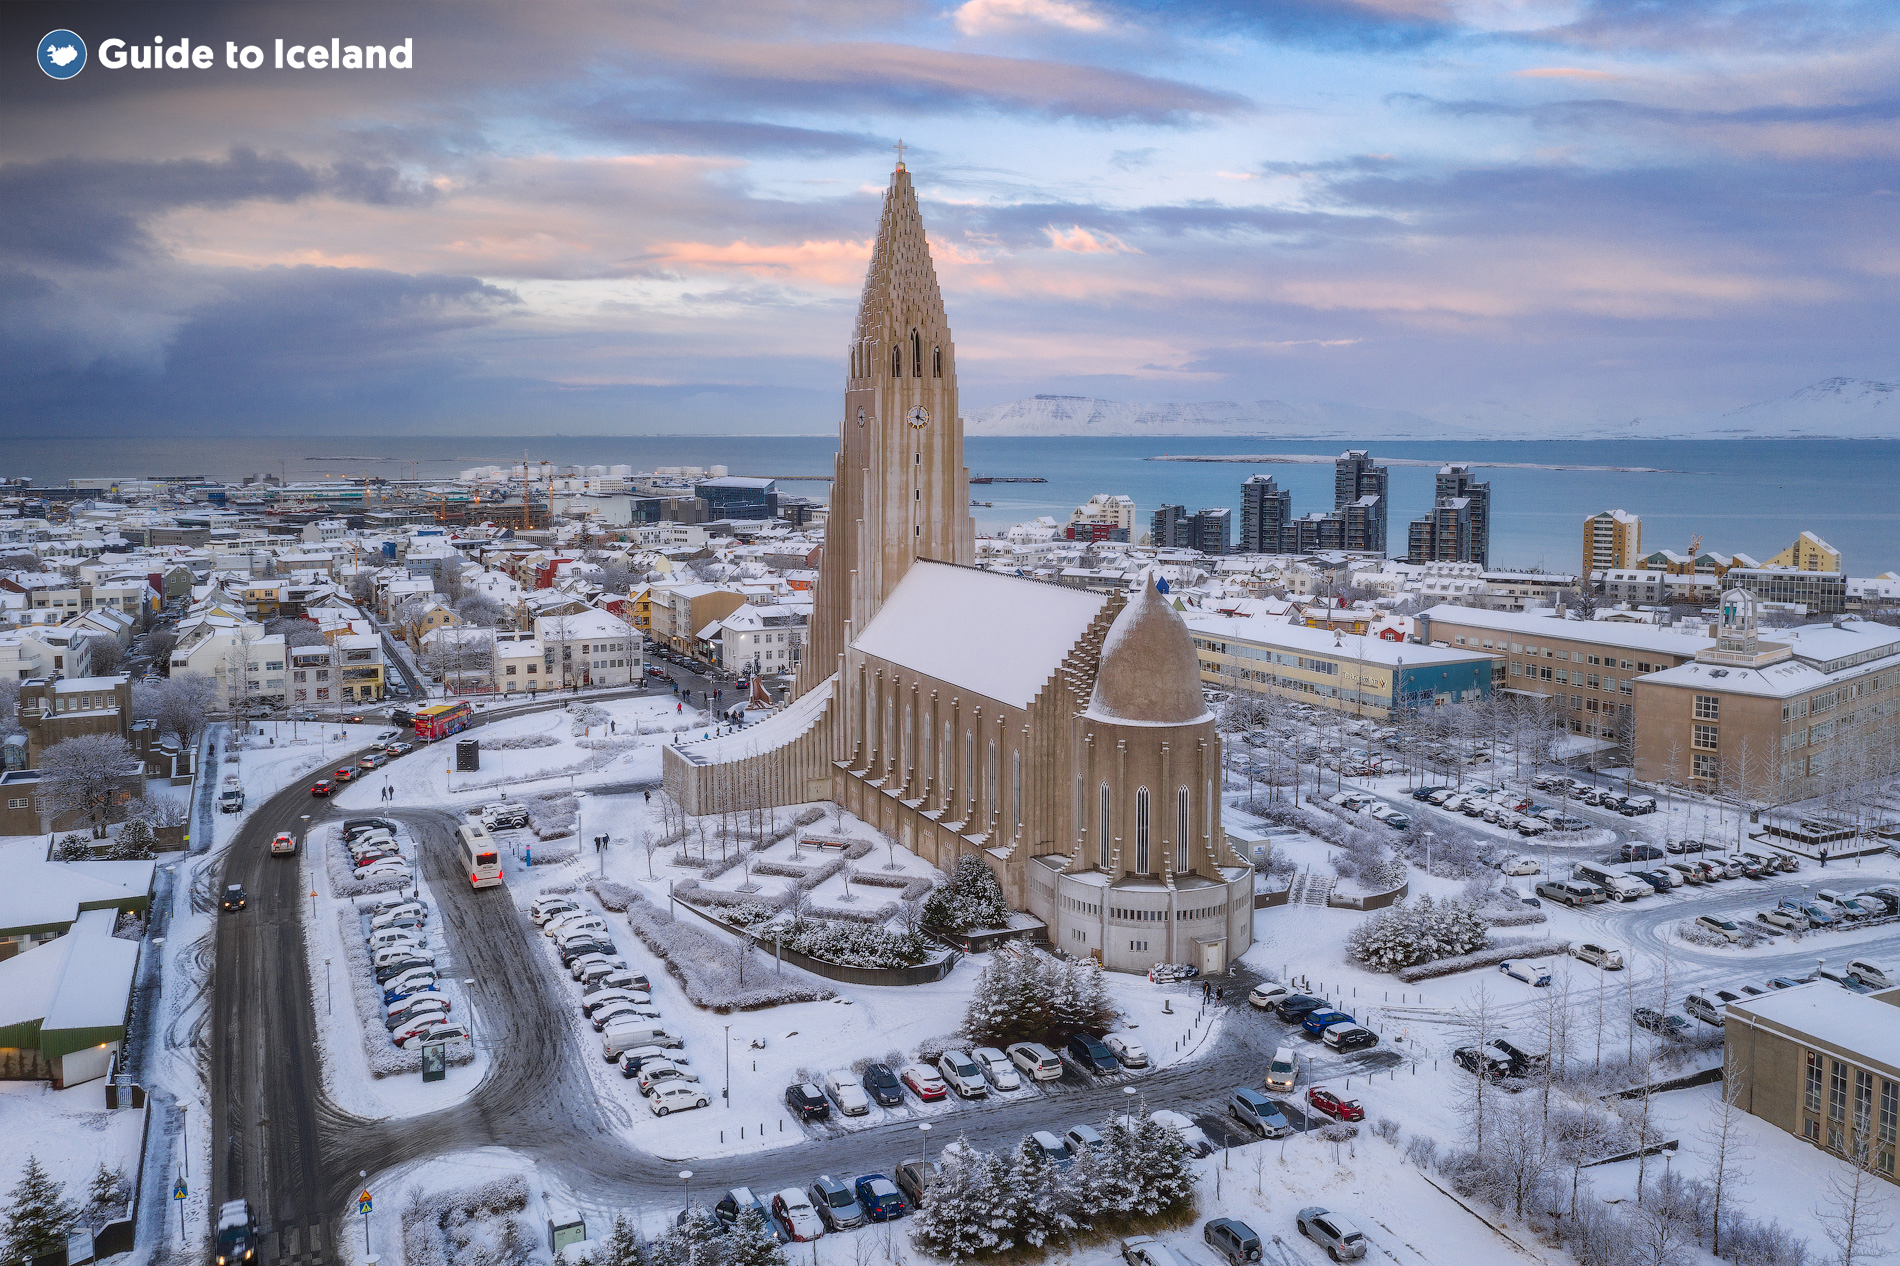 Hallgrimskirkja Church in downtown Reykjavik pictured from above in winter.